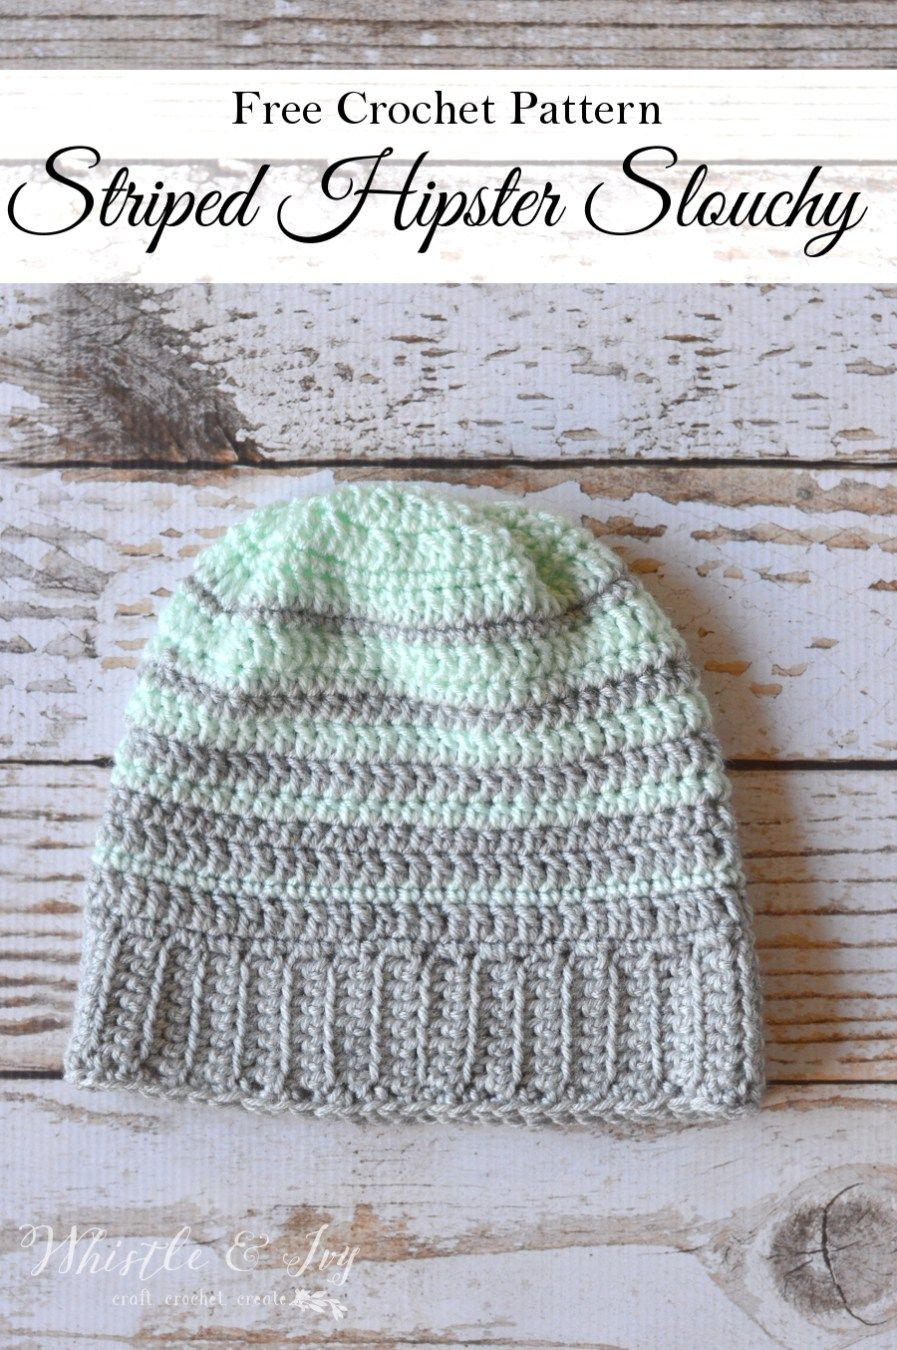 Striped Hipster Slouchy Beanie | Pinterest | Free crochet, Crochet ...